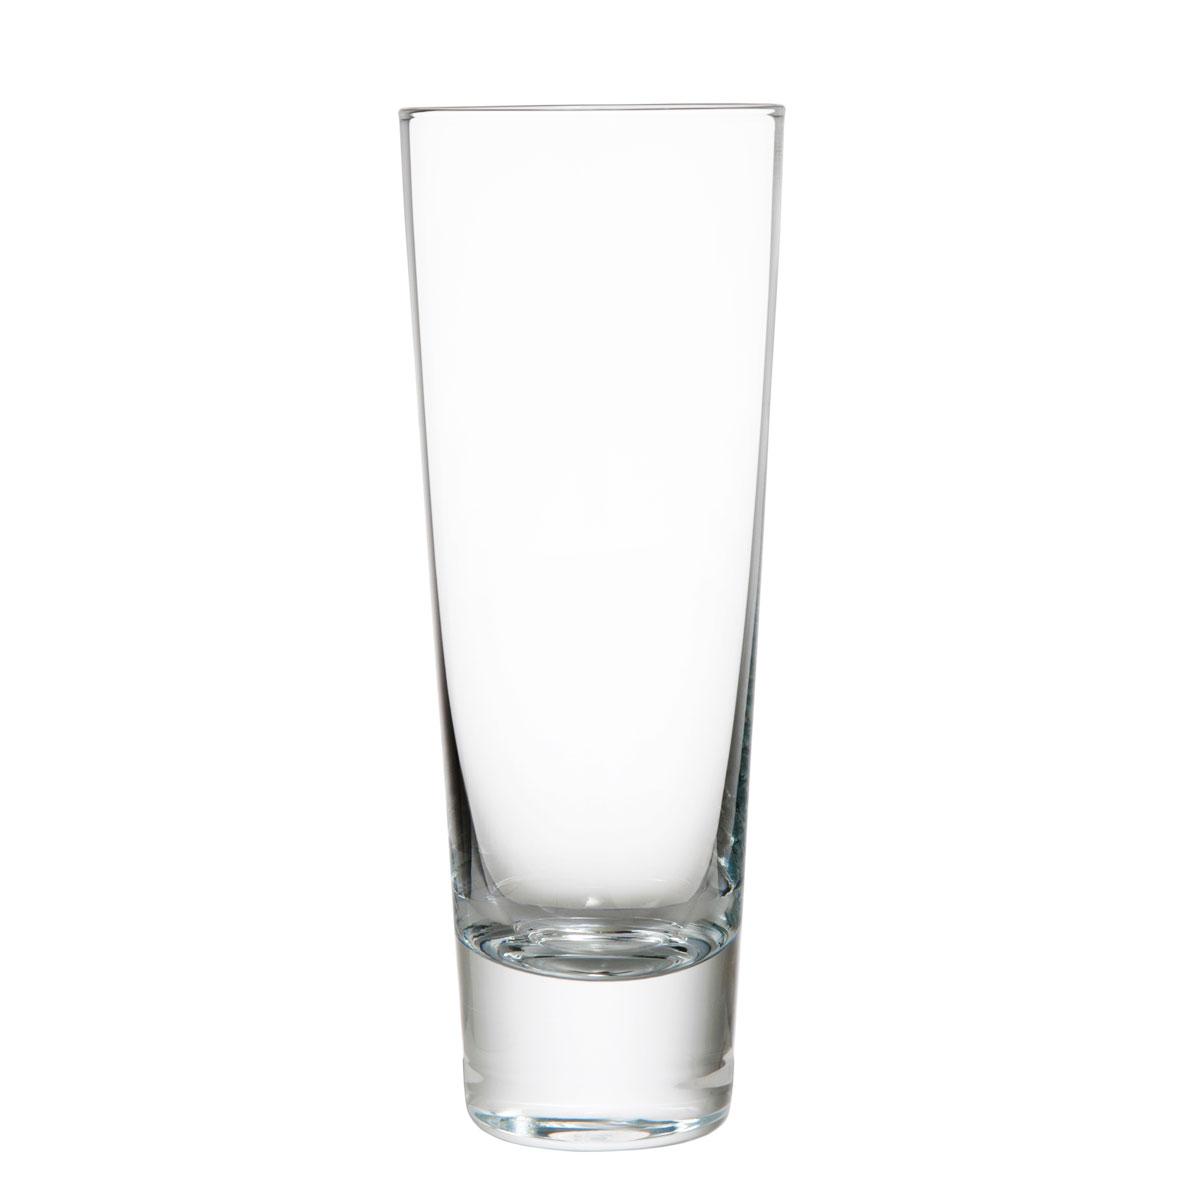 Schott Zwiesel Tritan Crystal, Tossa Iced Beverage, Single